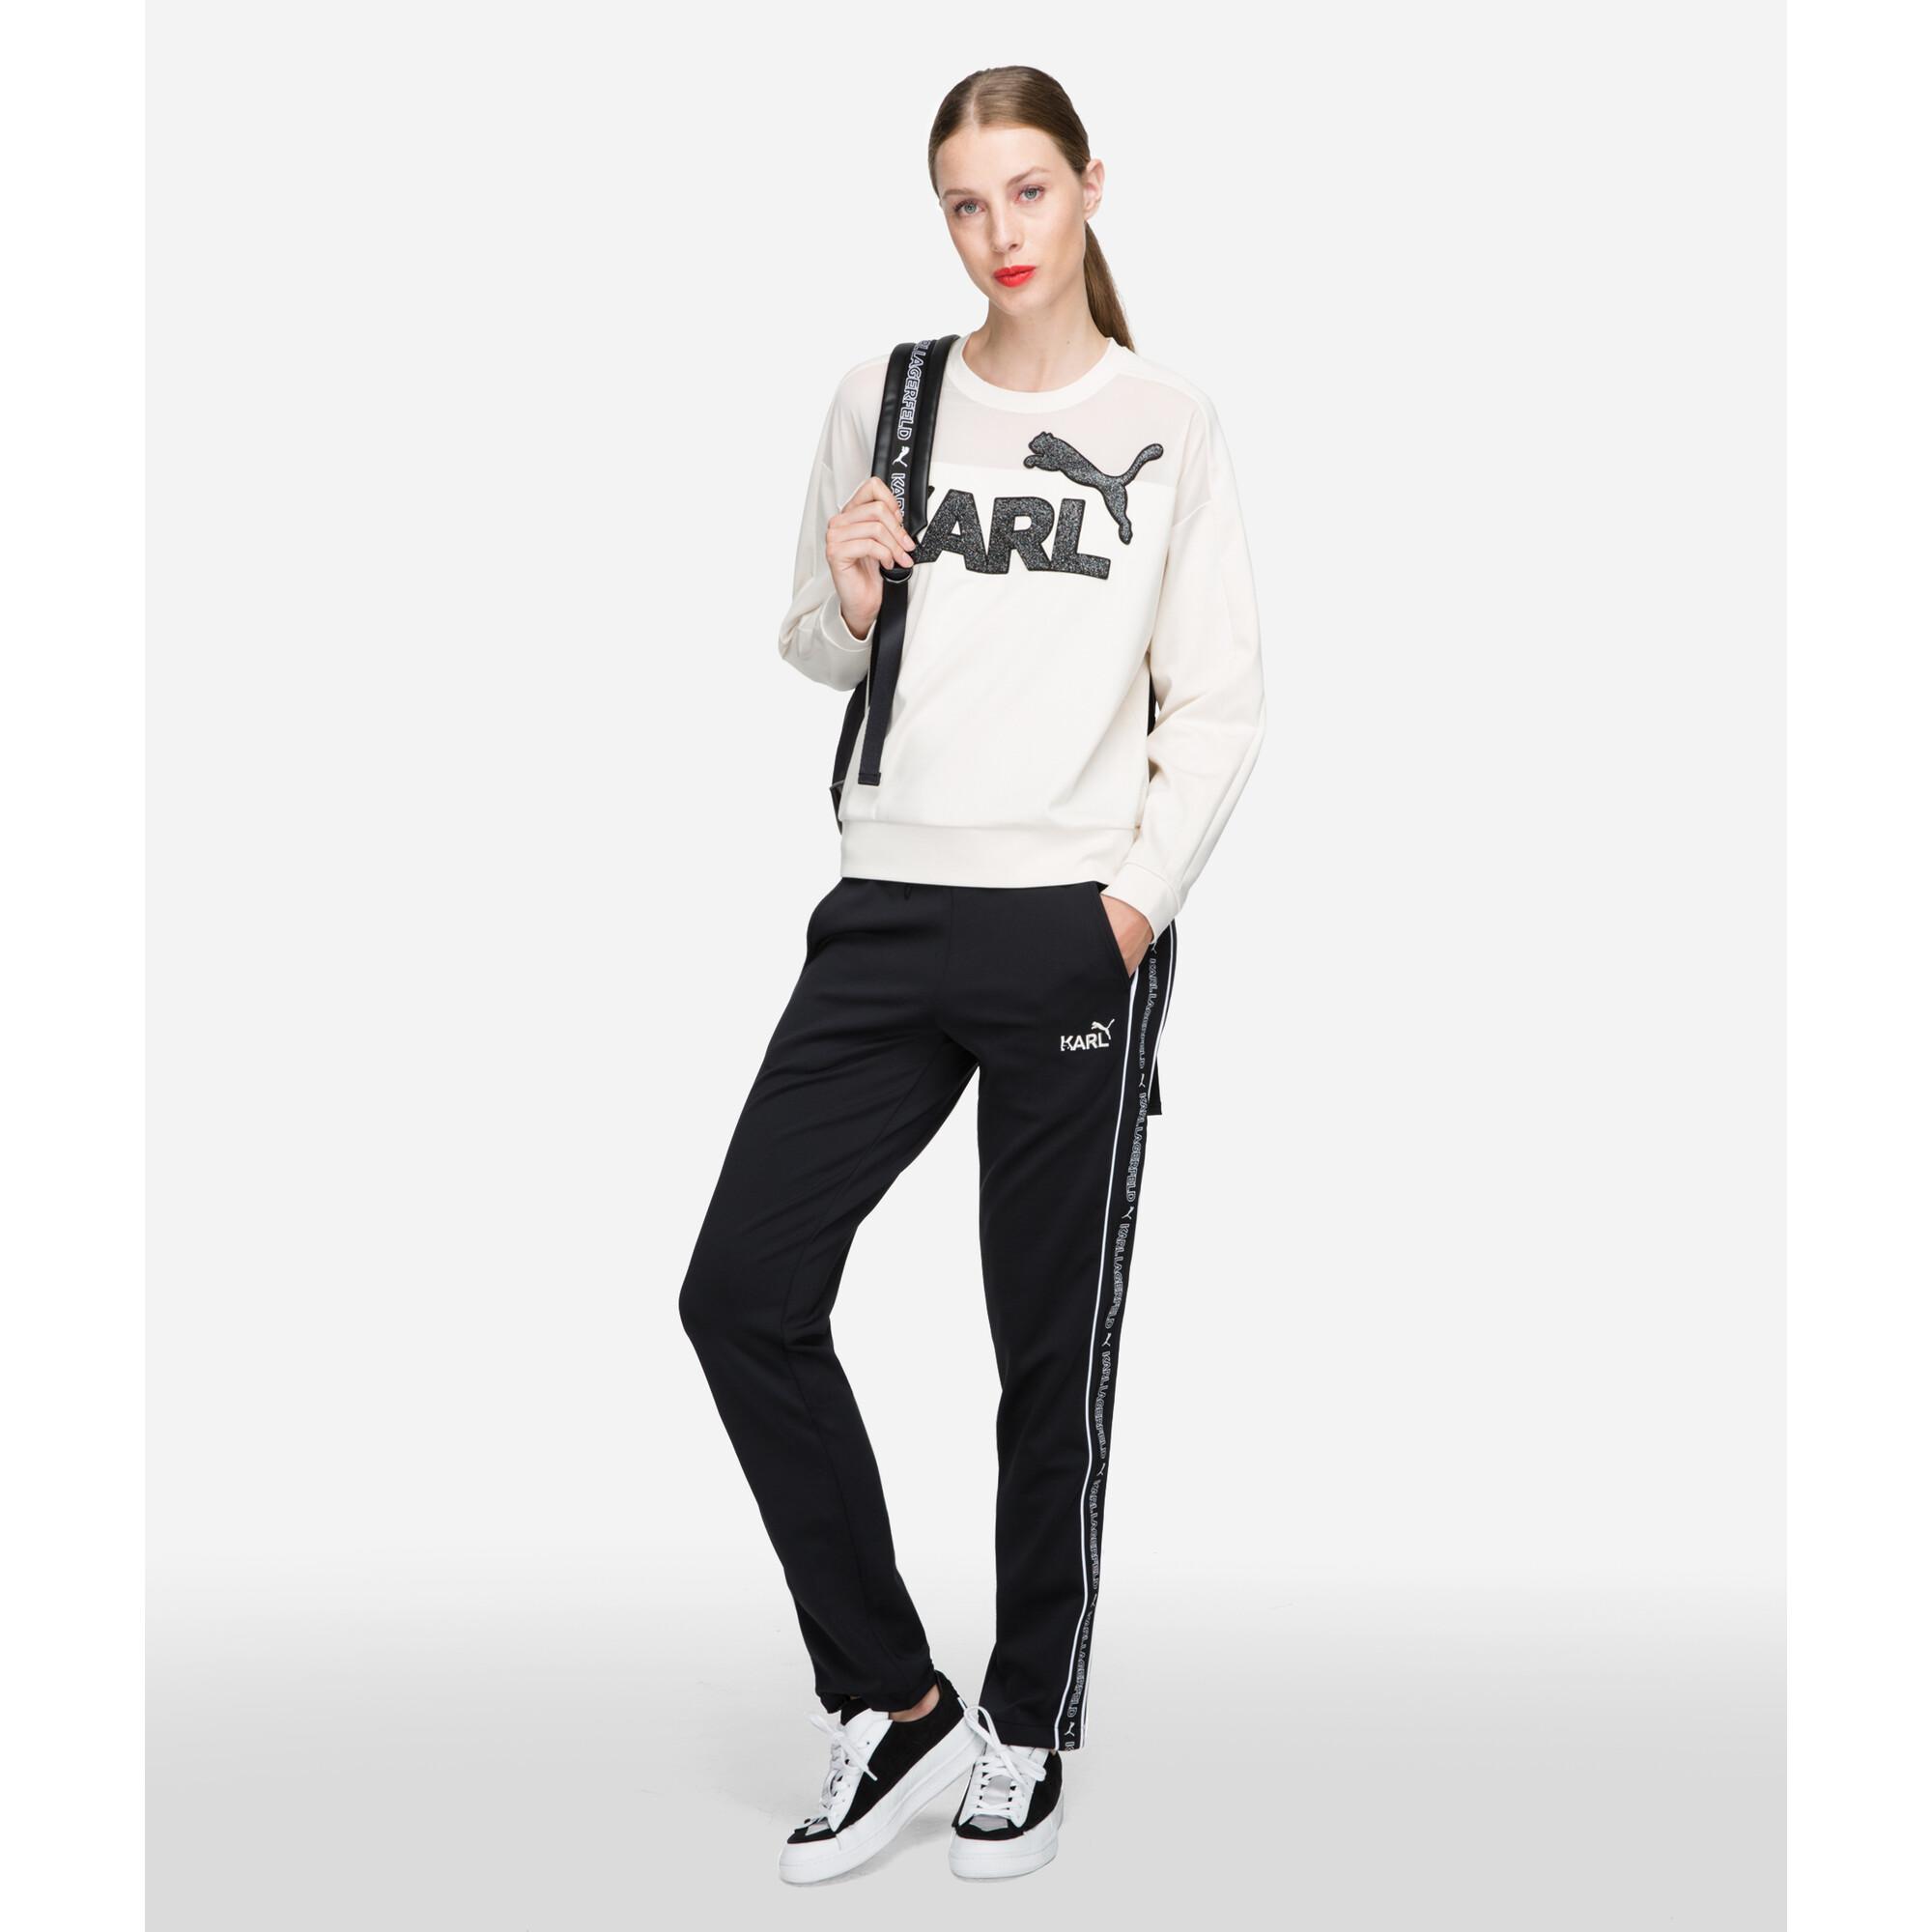 Image Puma PUMA x KARL LAGERFELD Women's Sweater #3